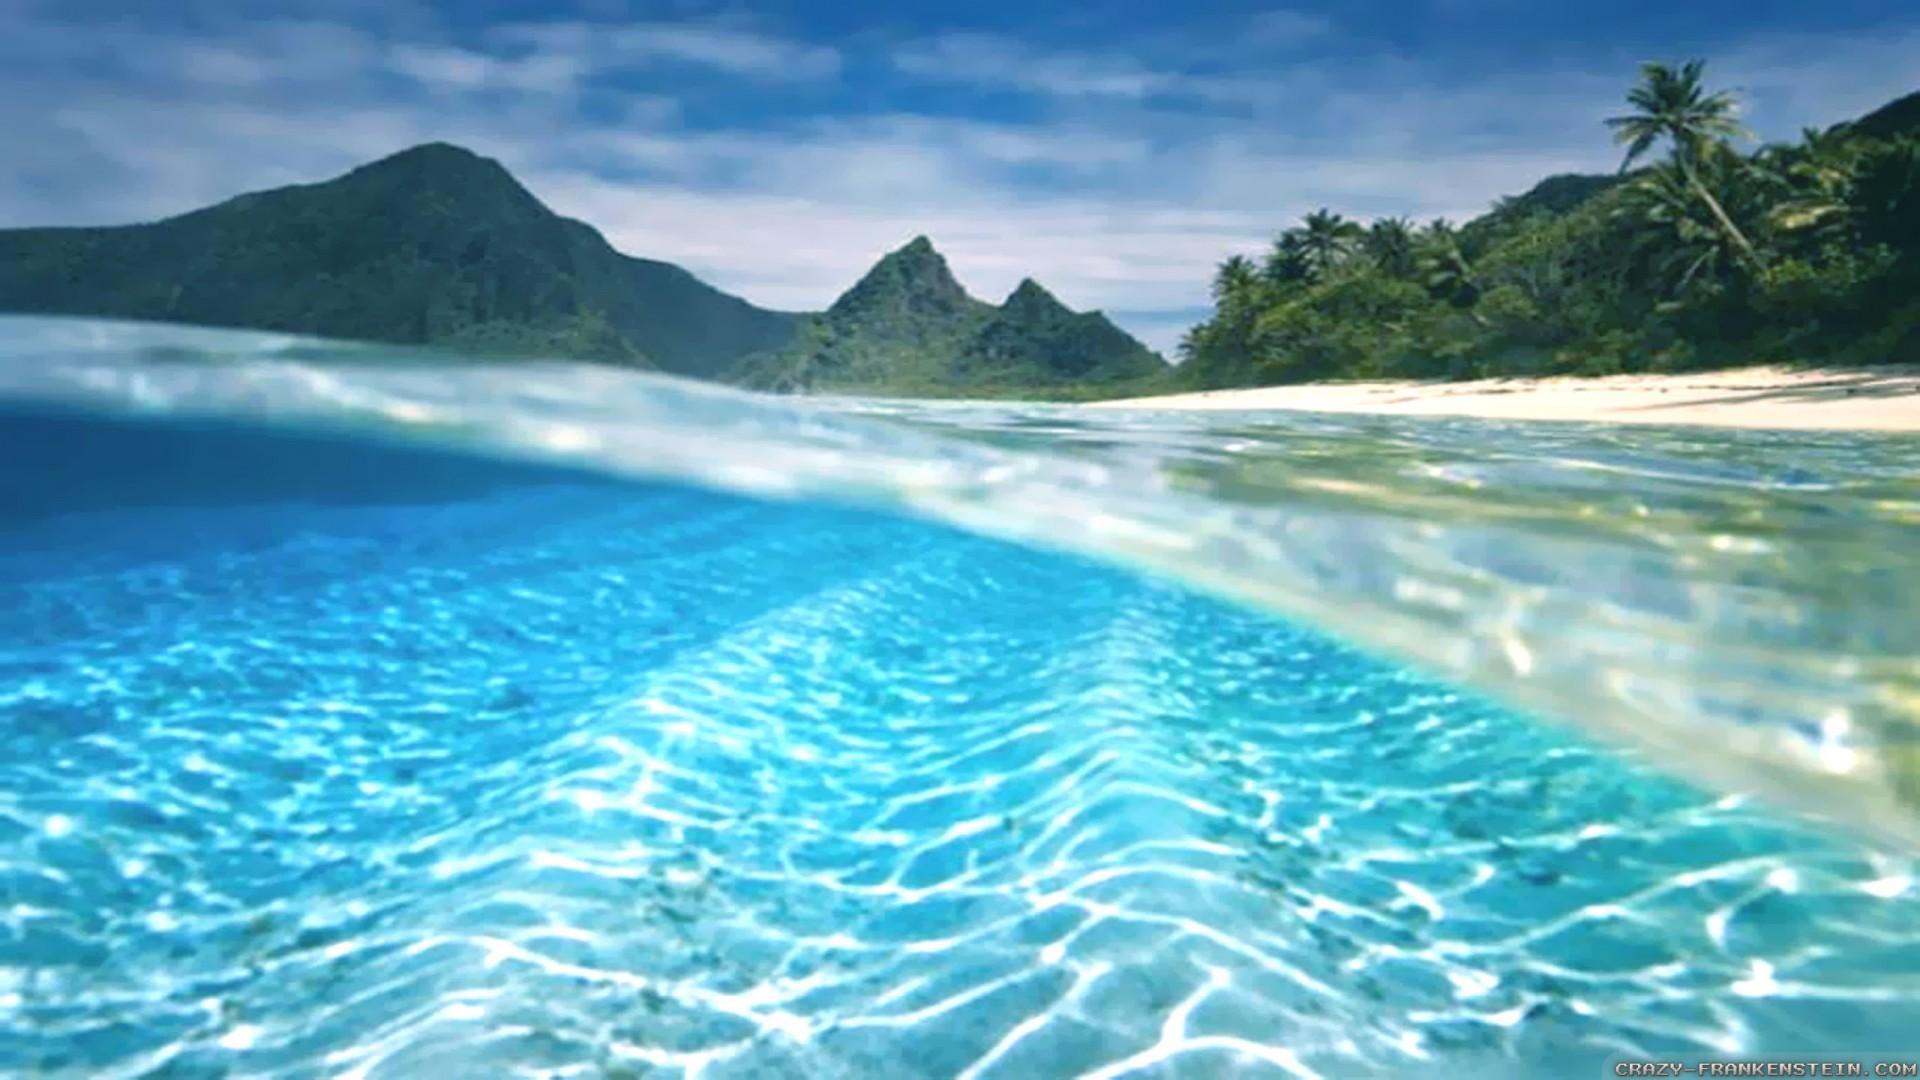 Underwater Beautiful Summer Wallpapers 2560x1440 1920x1080